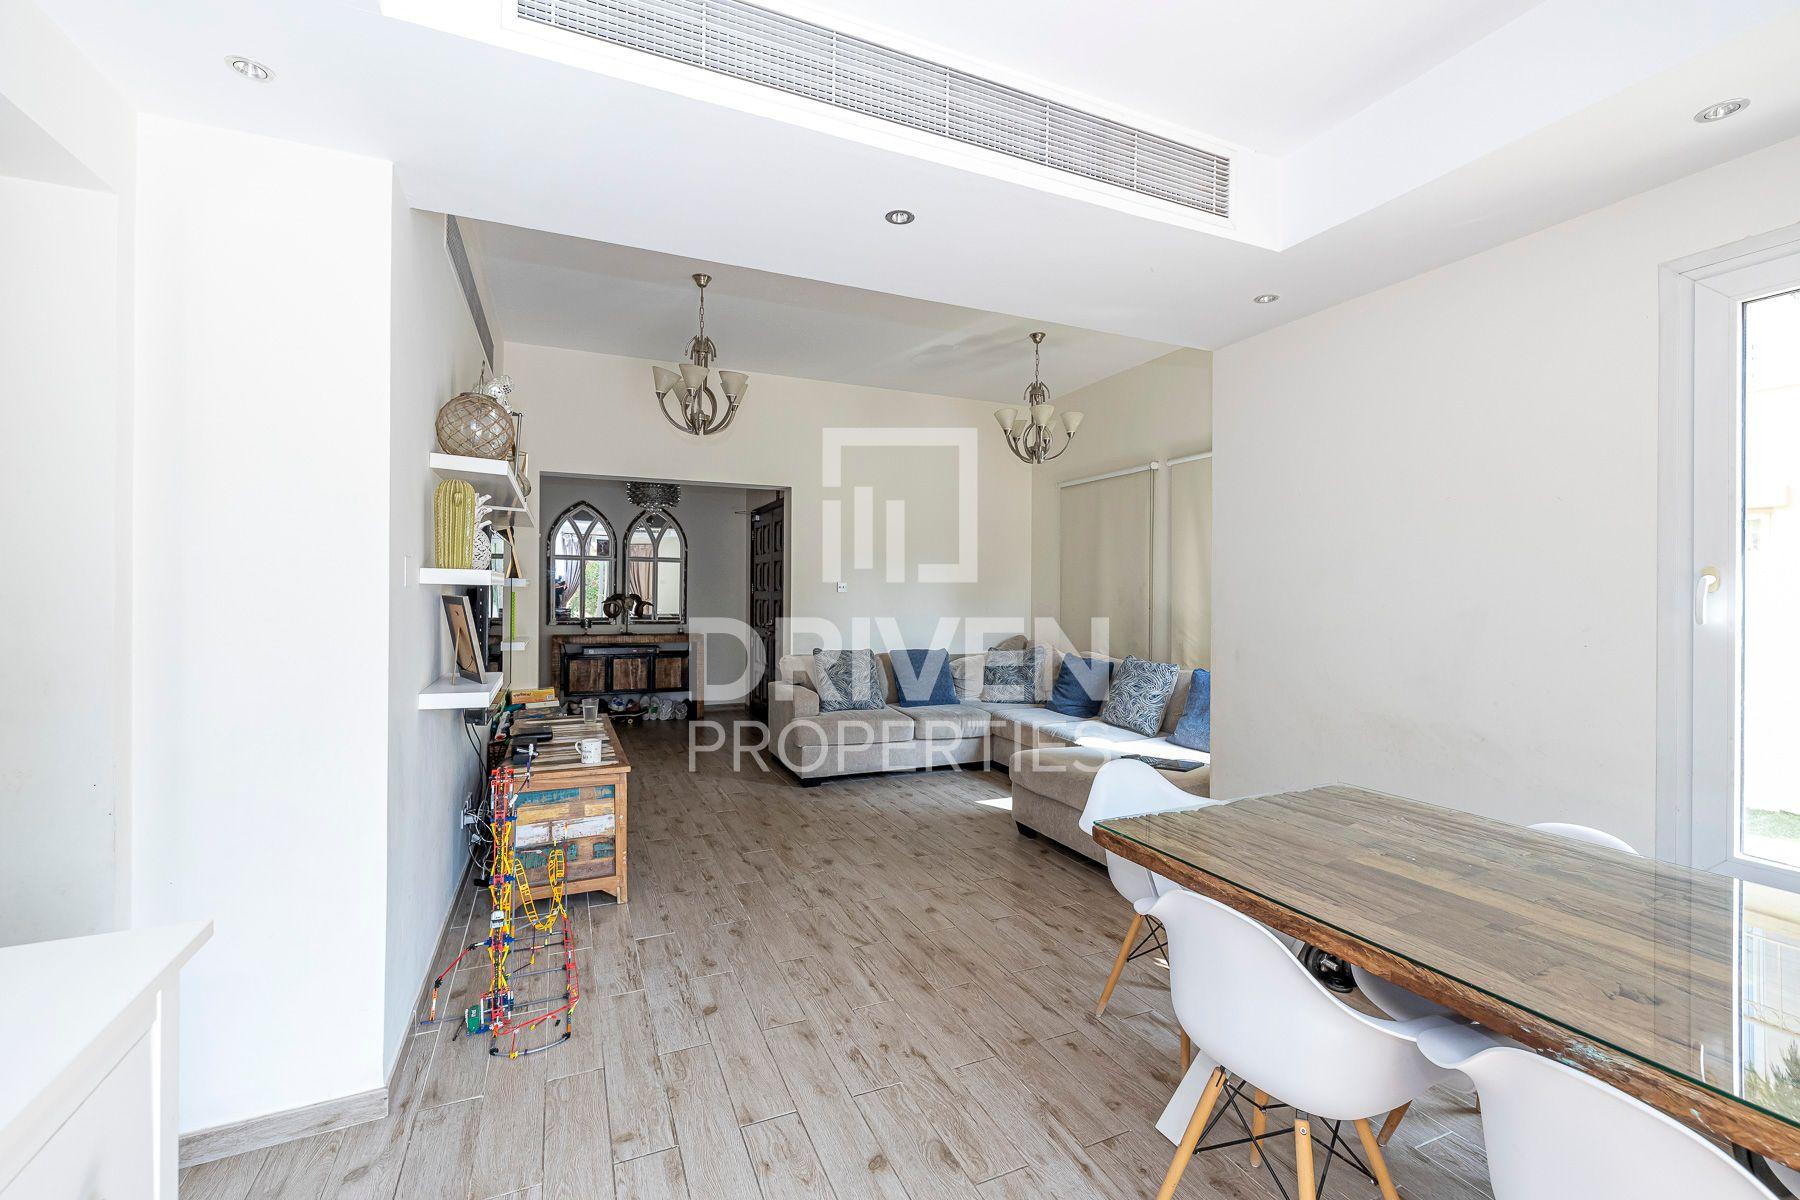 Villa for Sale in Springs 10 - The Springs